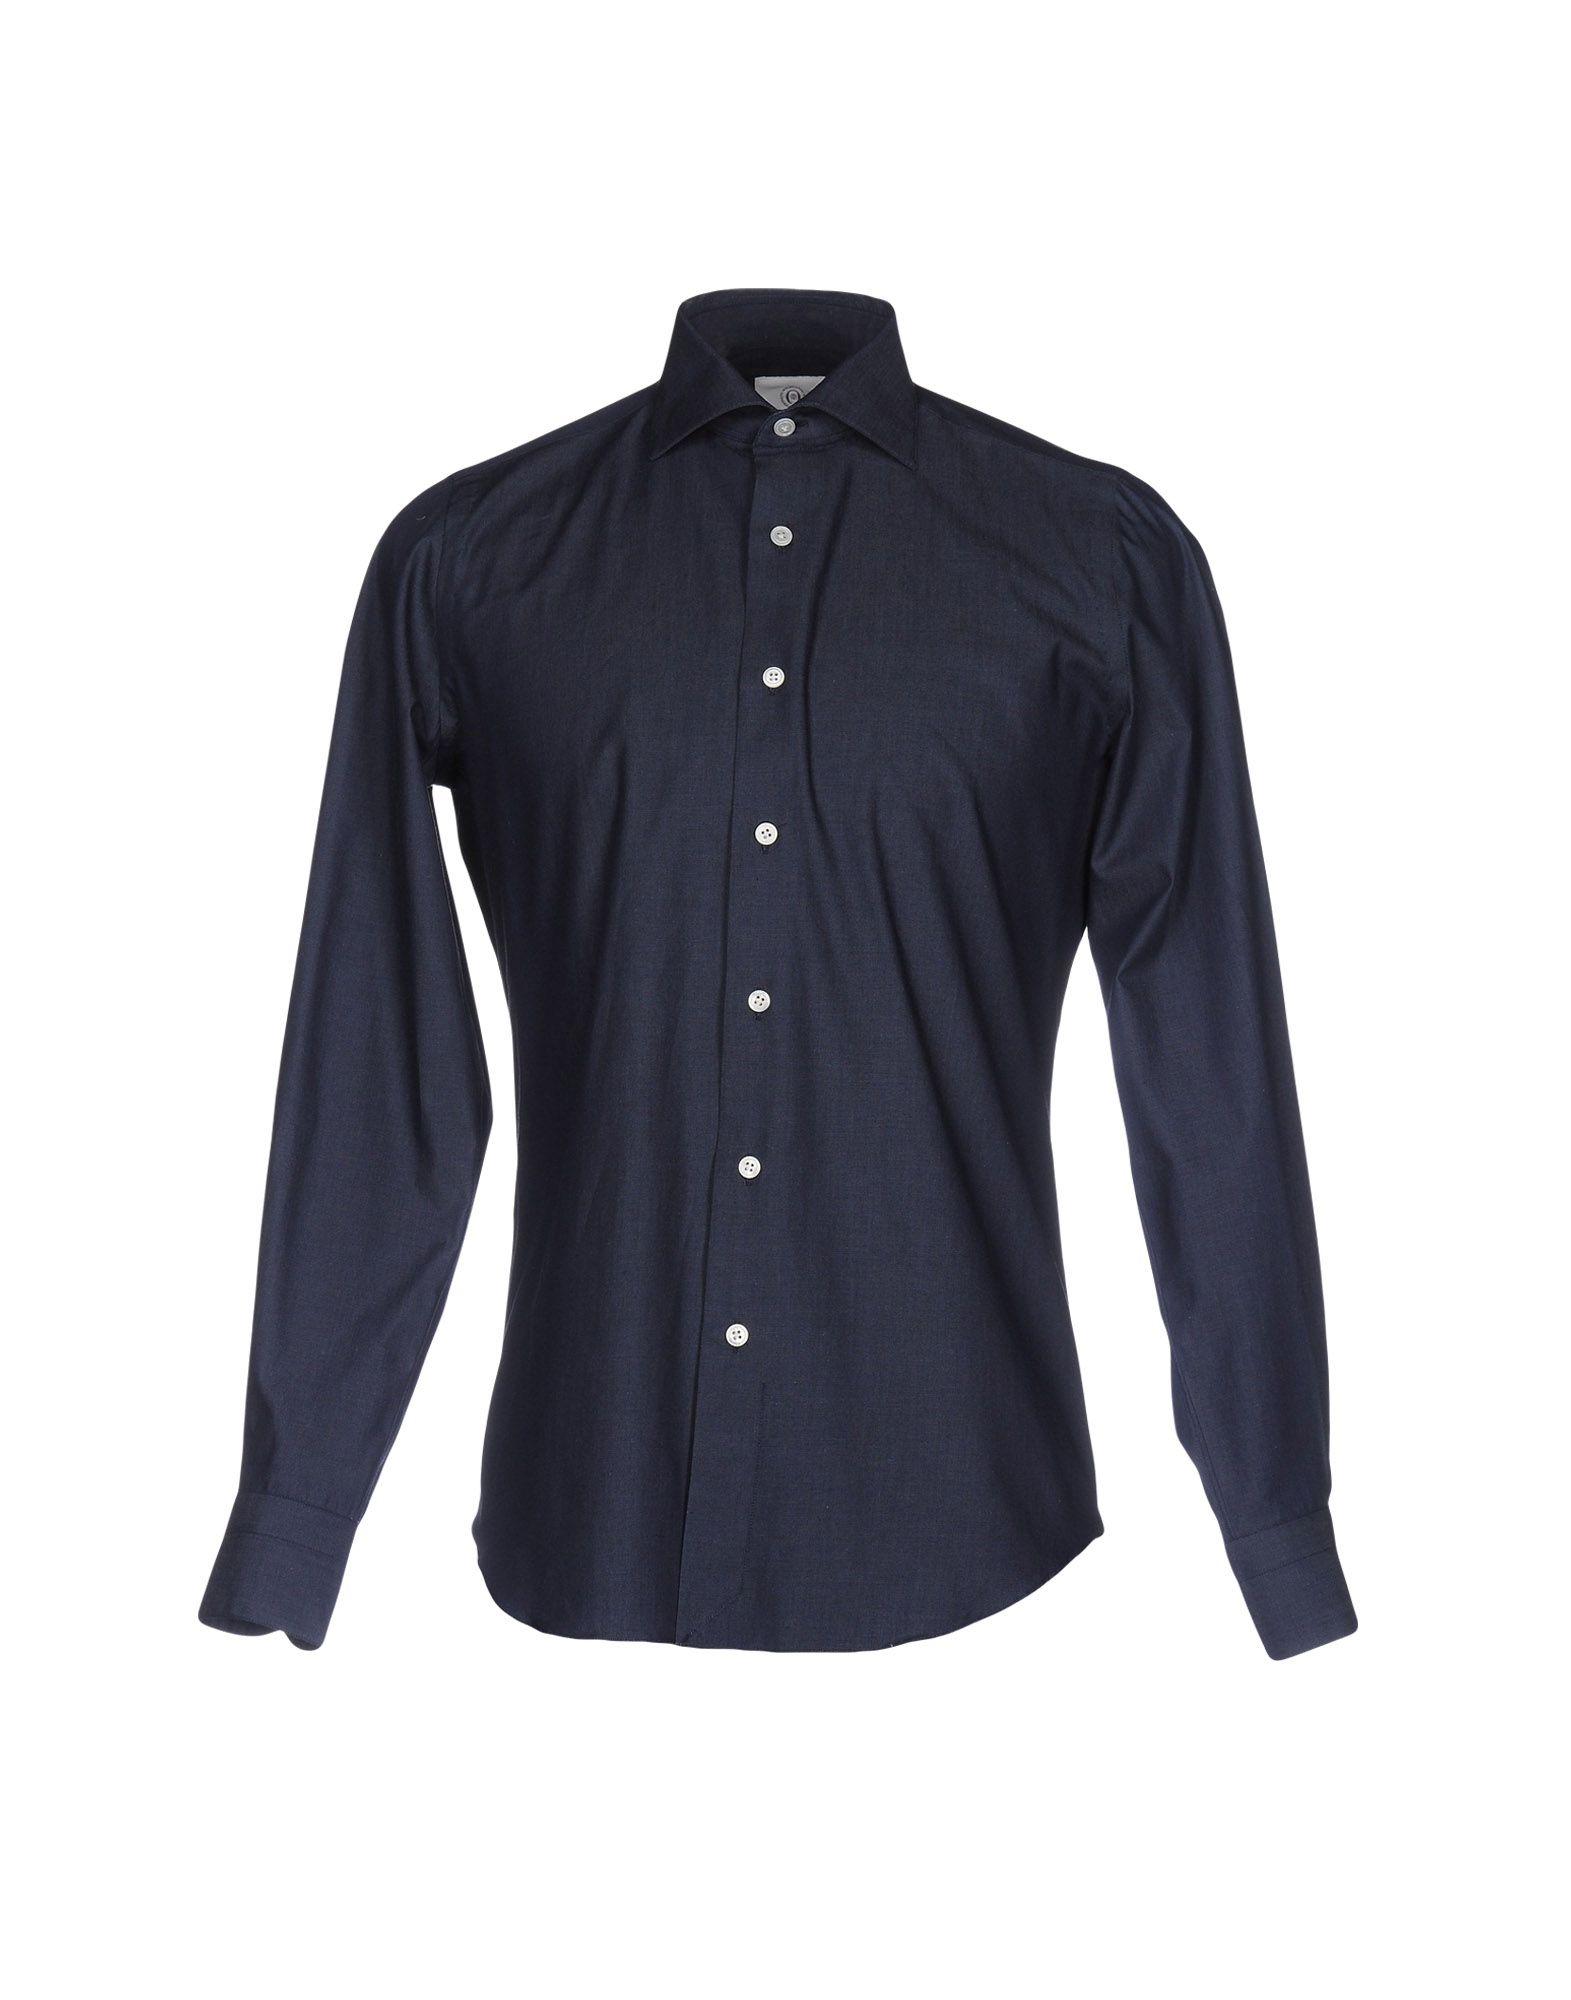 MASSIMO LA PORTA Джинсовая рубашка раковина на пьедестале porta antique lp236 p236